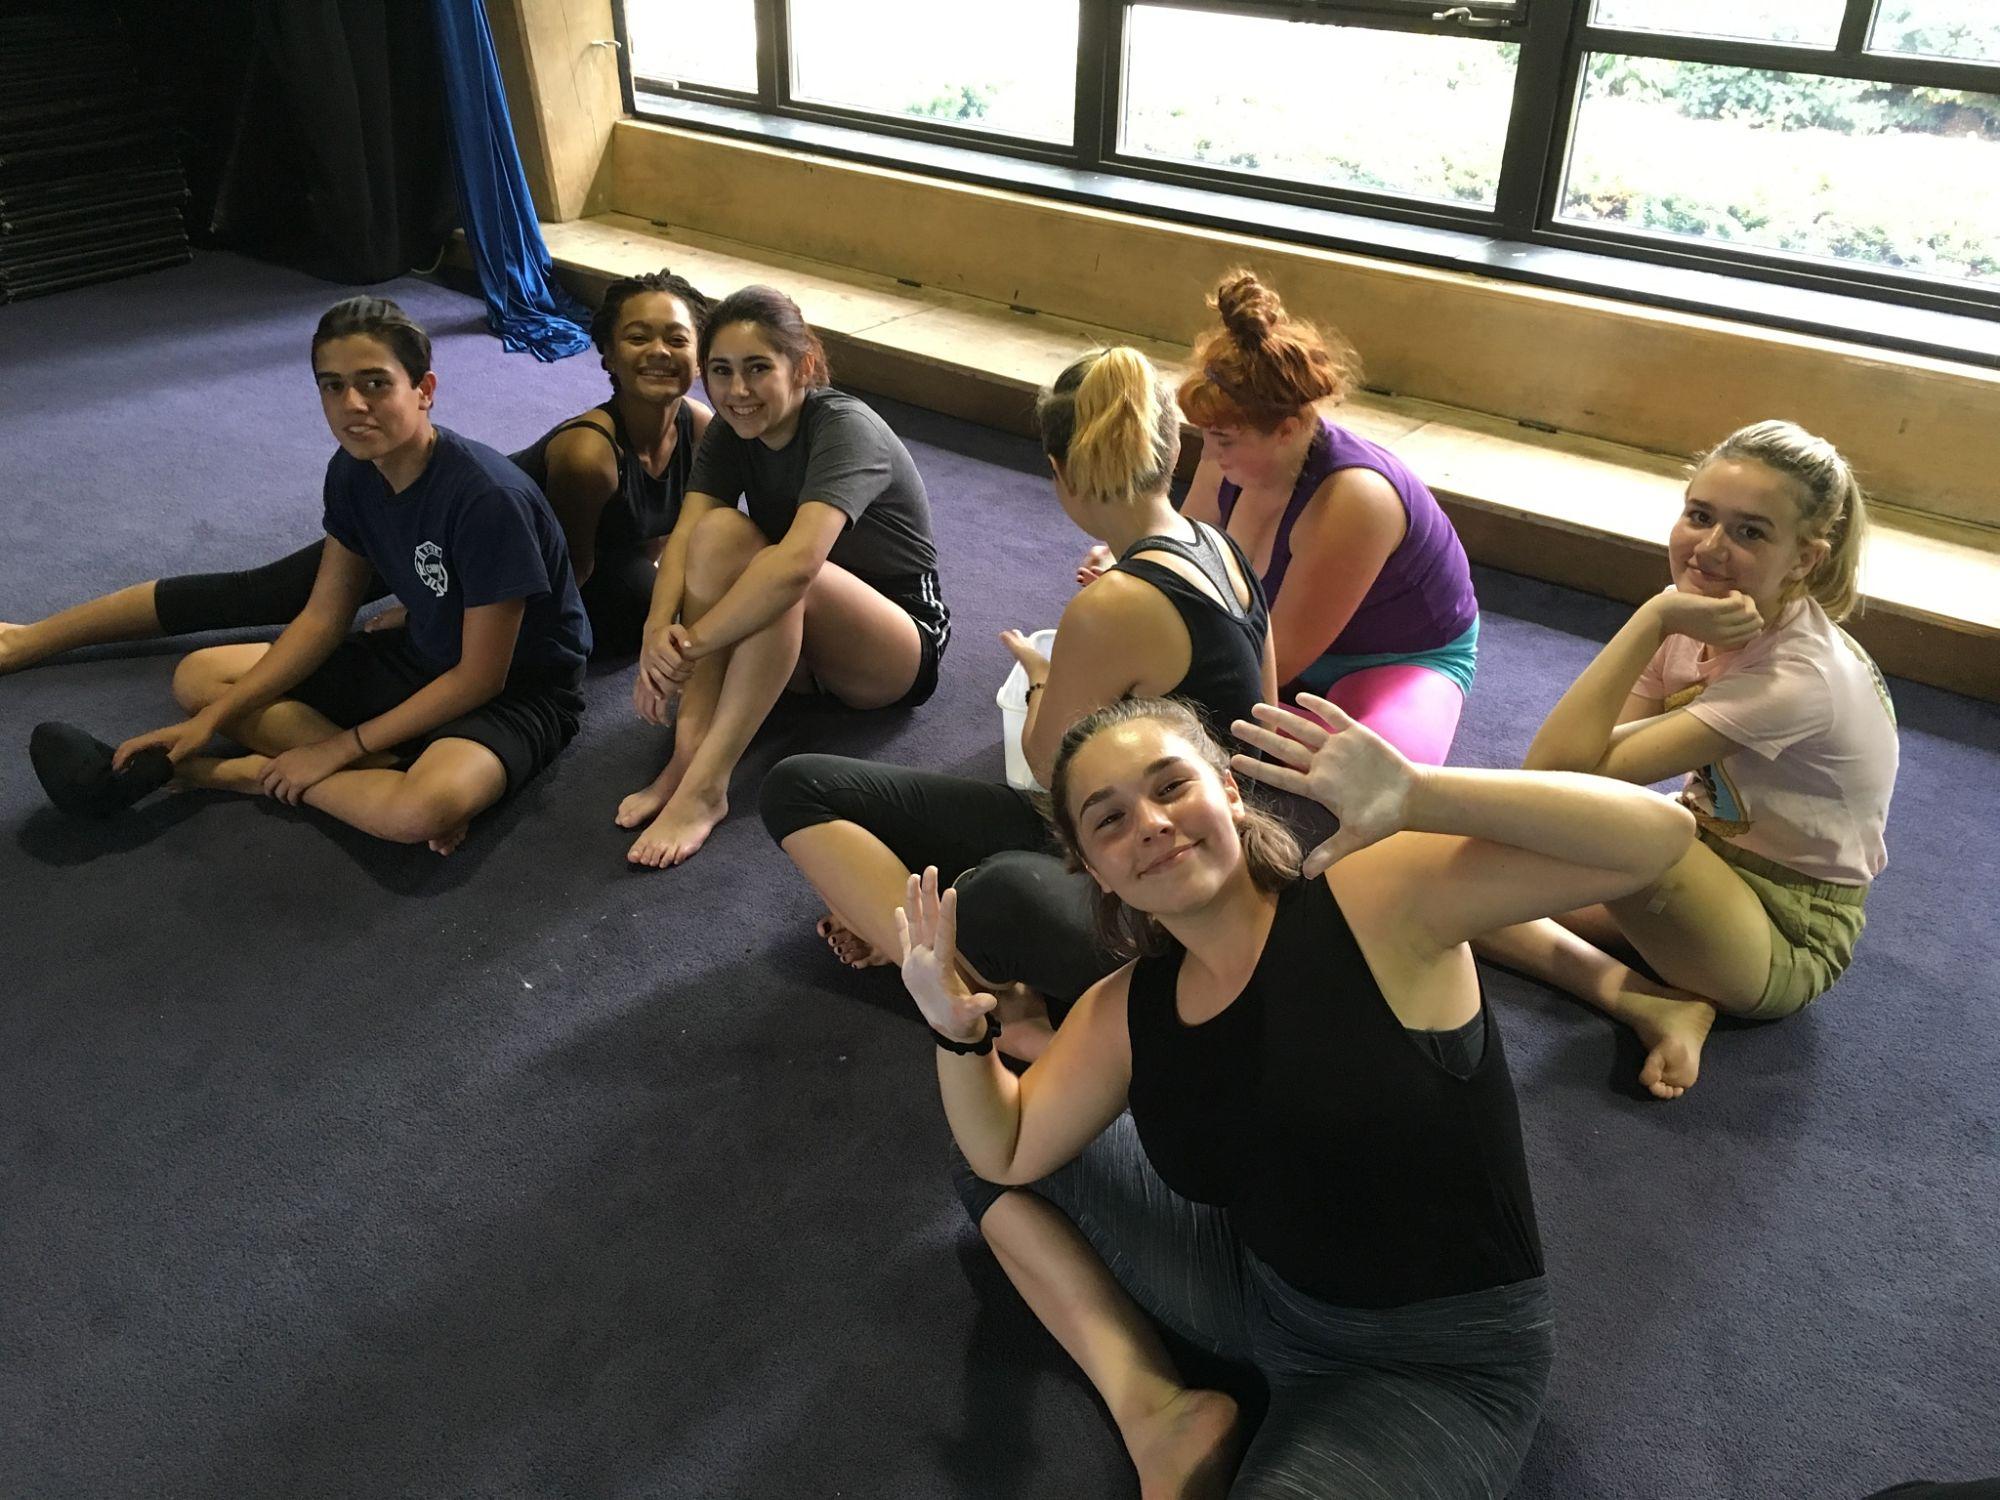 TheatreStudentsSmiling.jpg